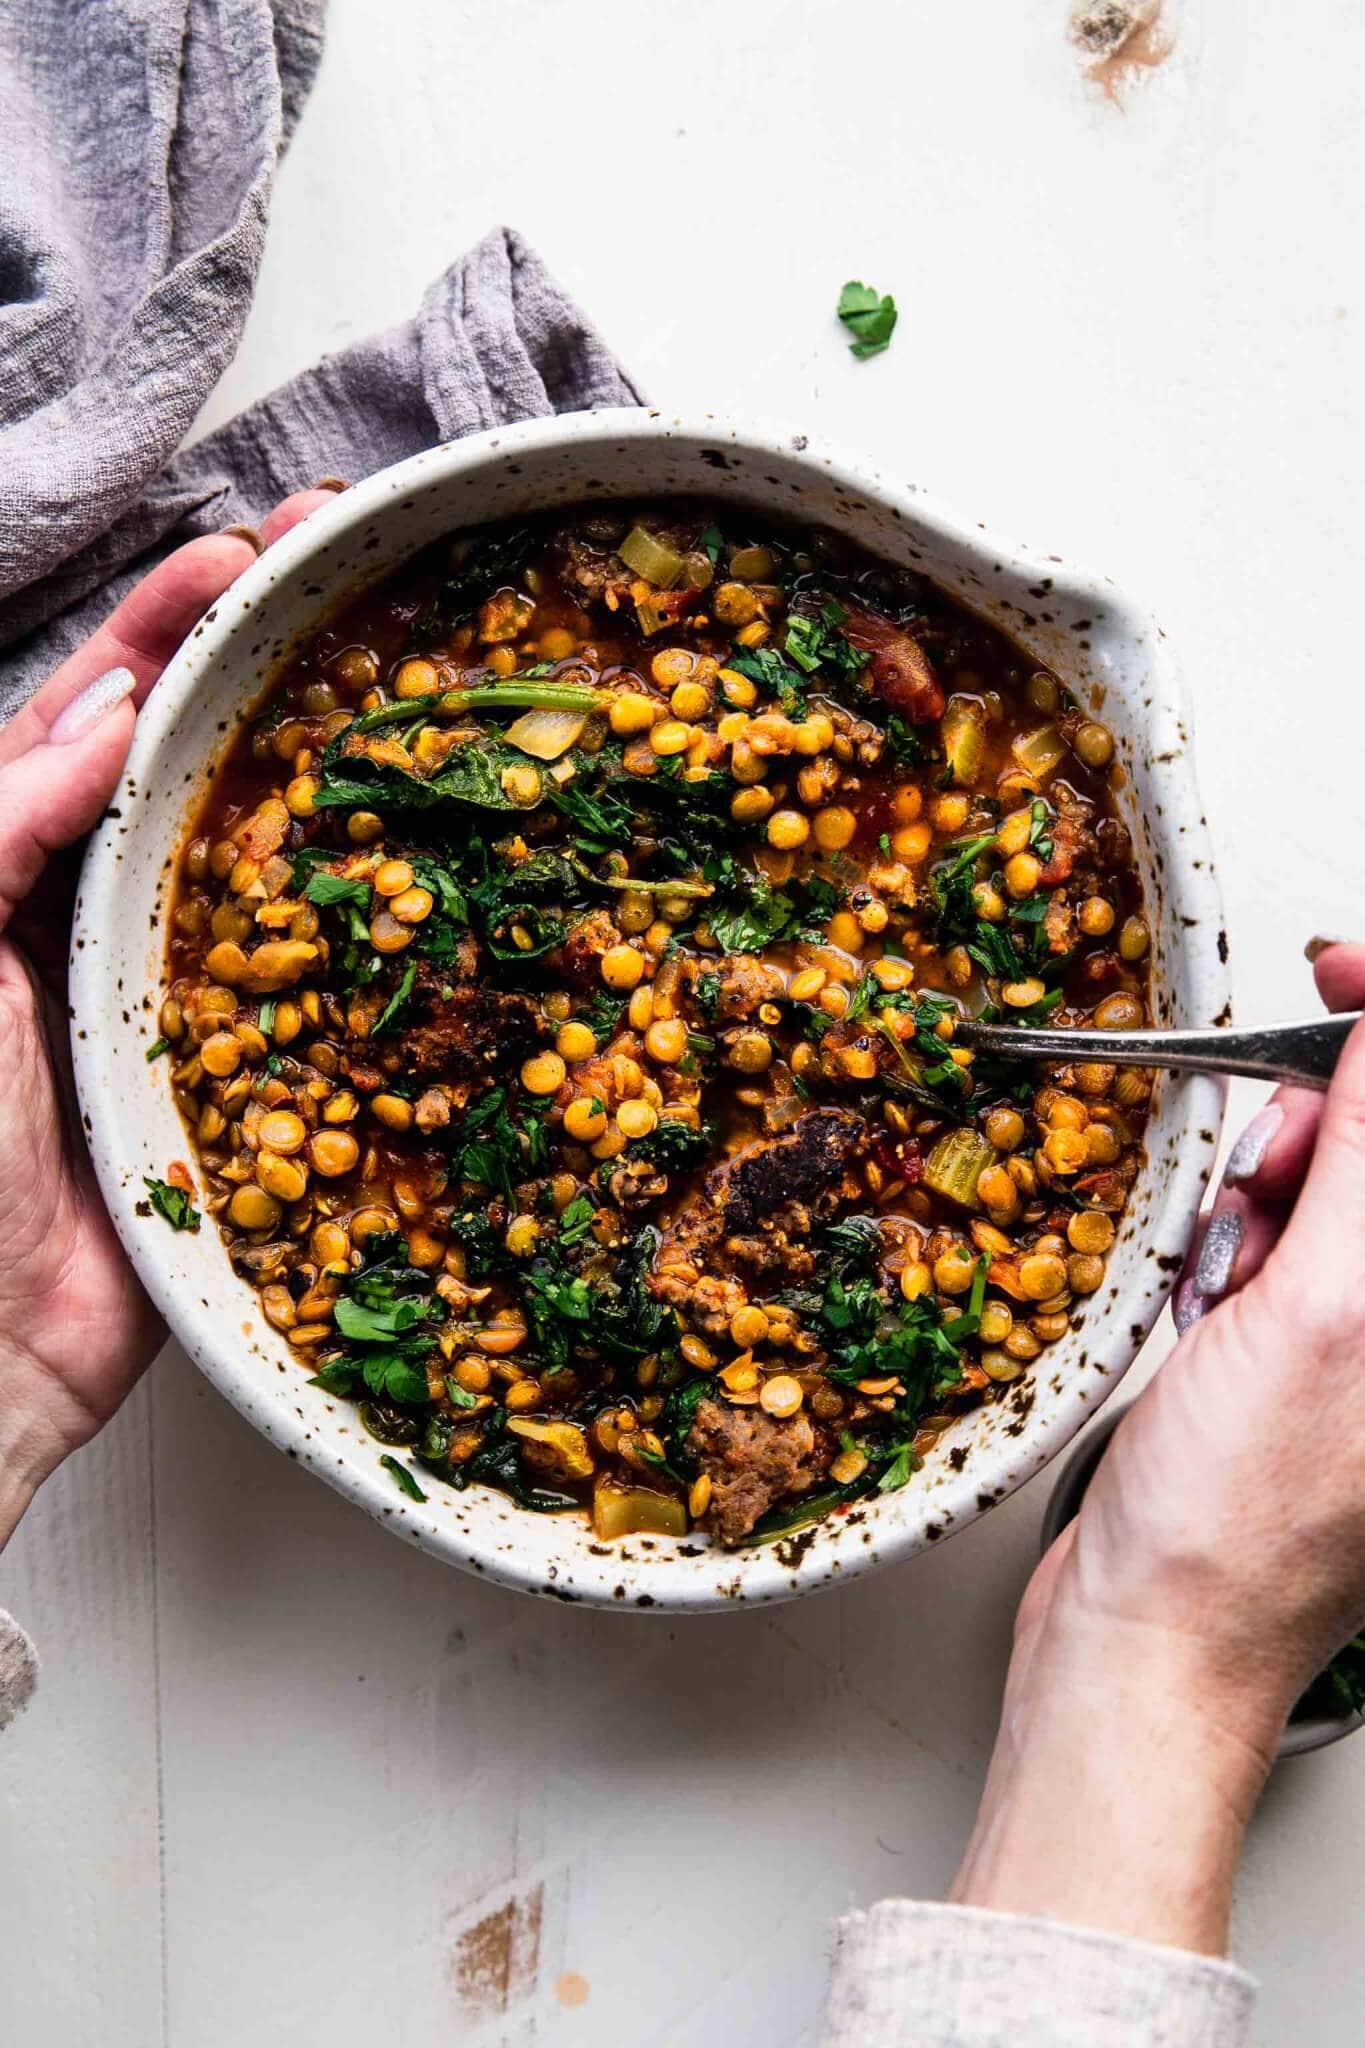 Two hands holding bowl of sausage kale lentil soup